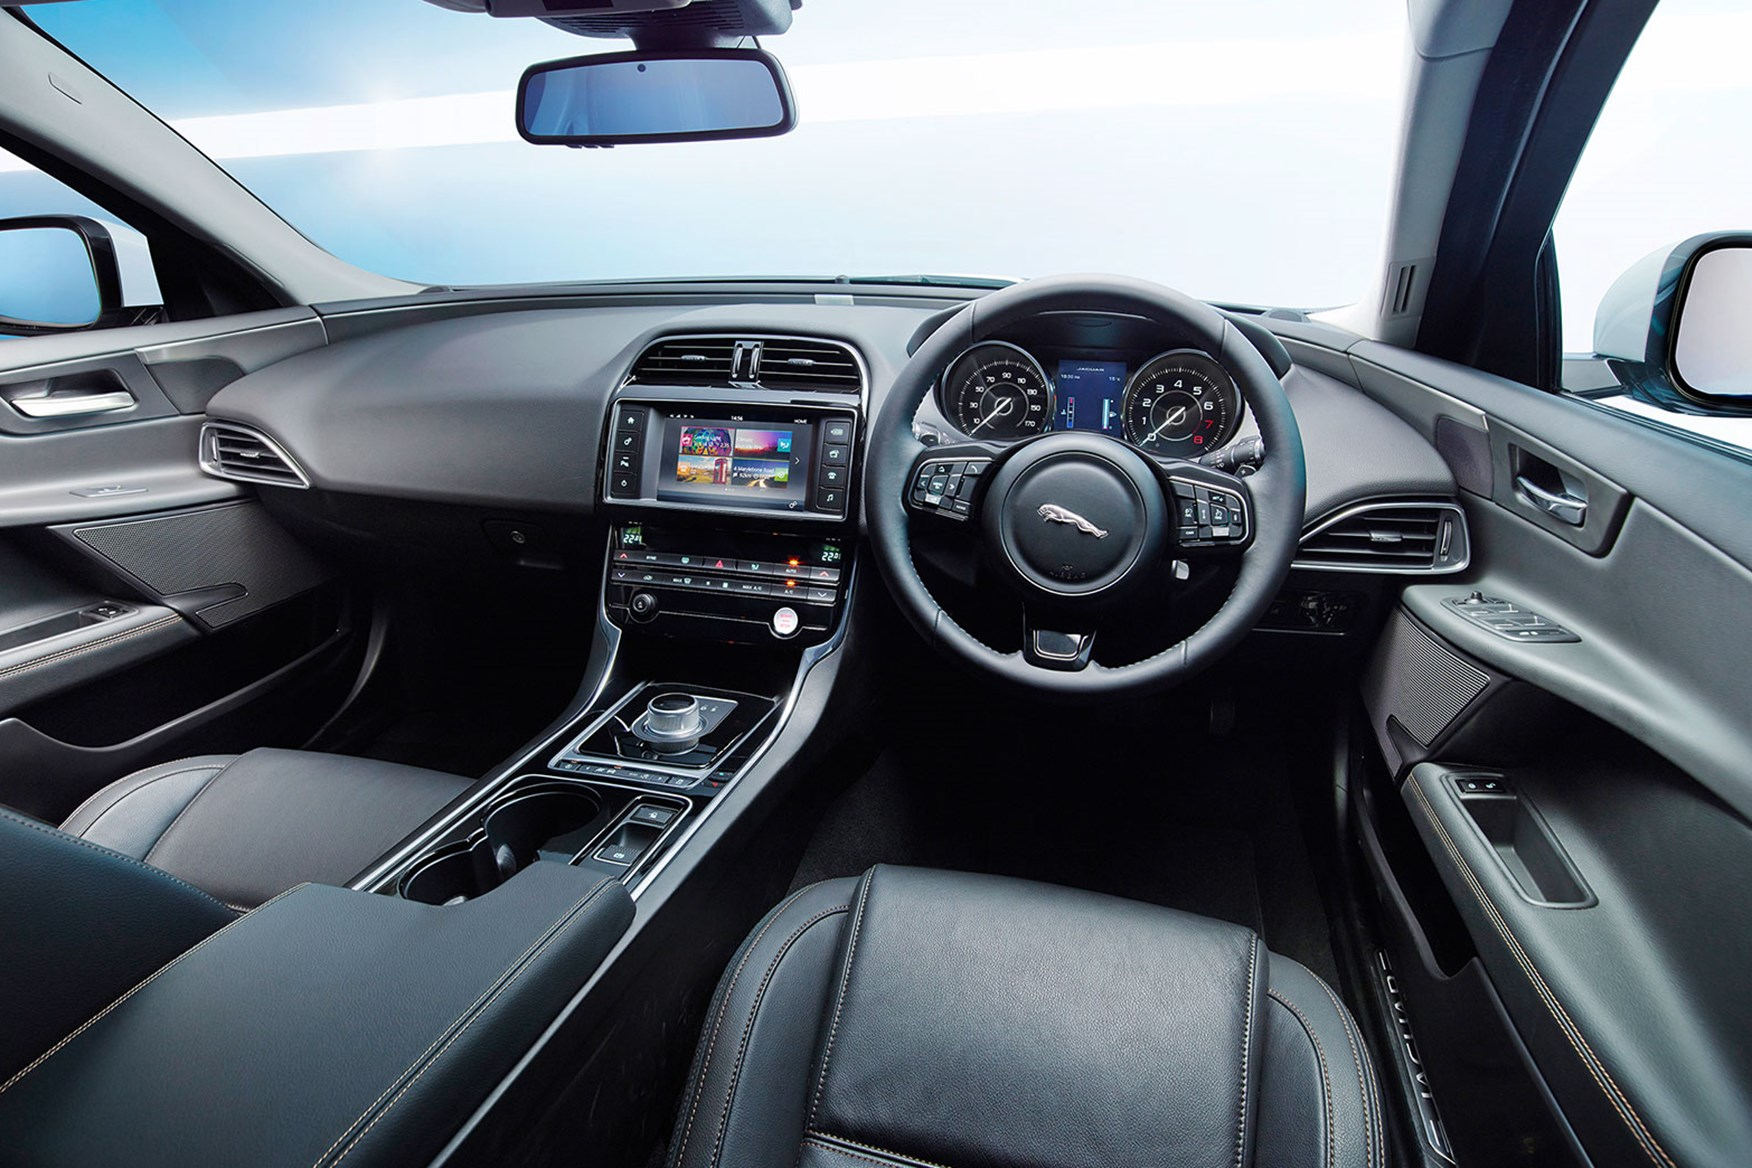 jaguar xe interior images galleries with a bite. Black Bedroom Furniture Sets. Home Design Ideas